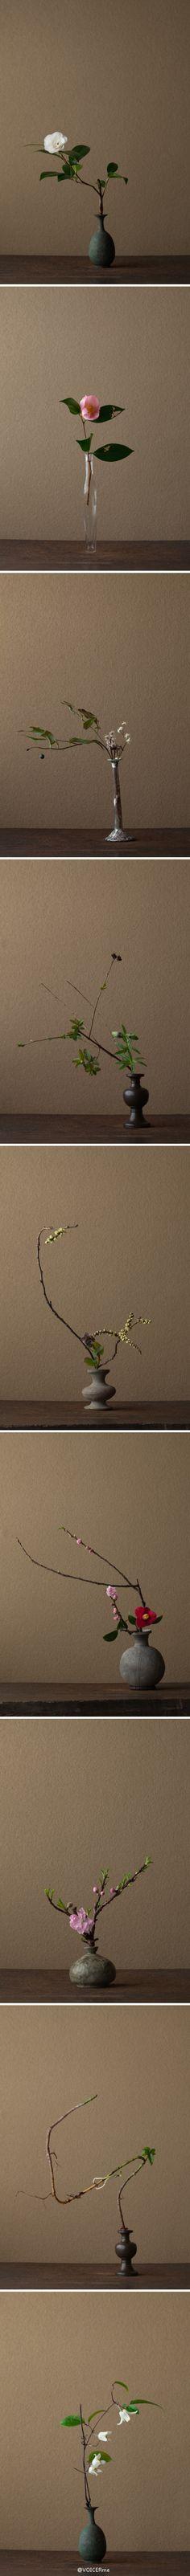 Beautiful simplicity of Japanese Ikebana.